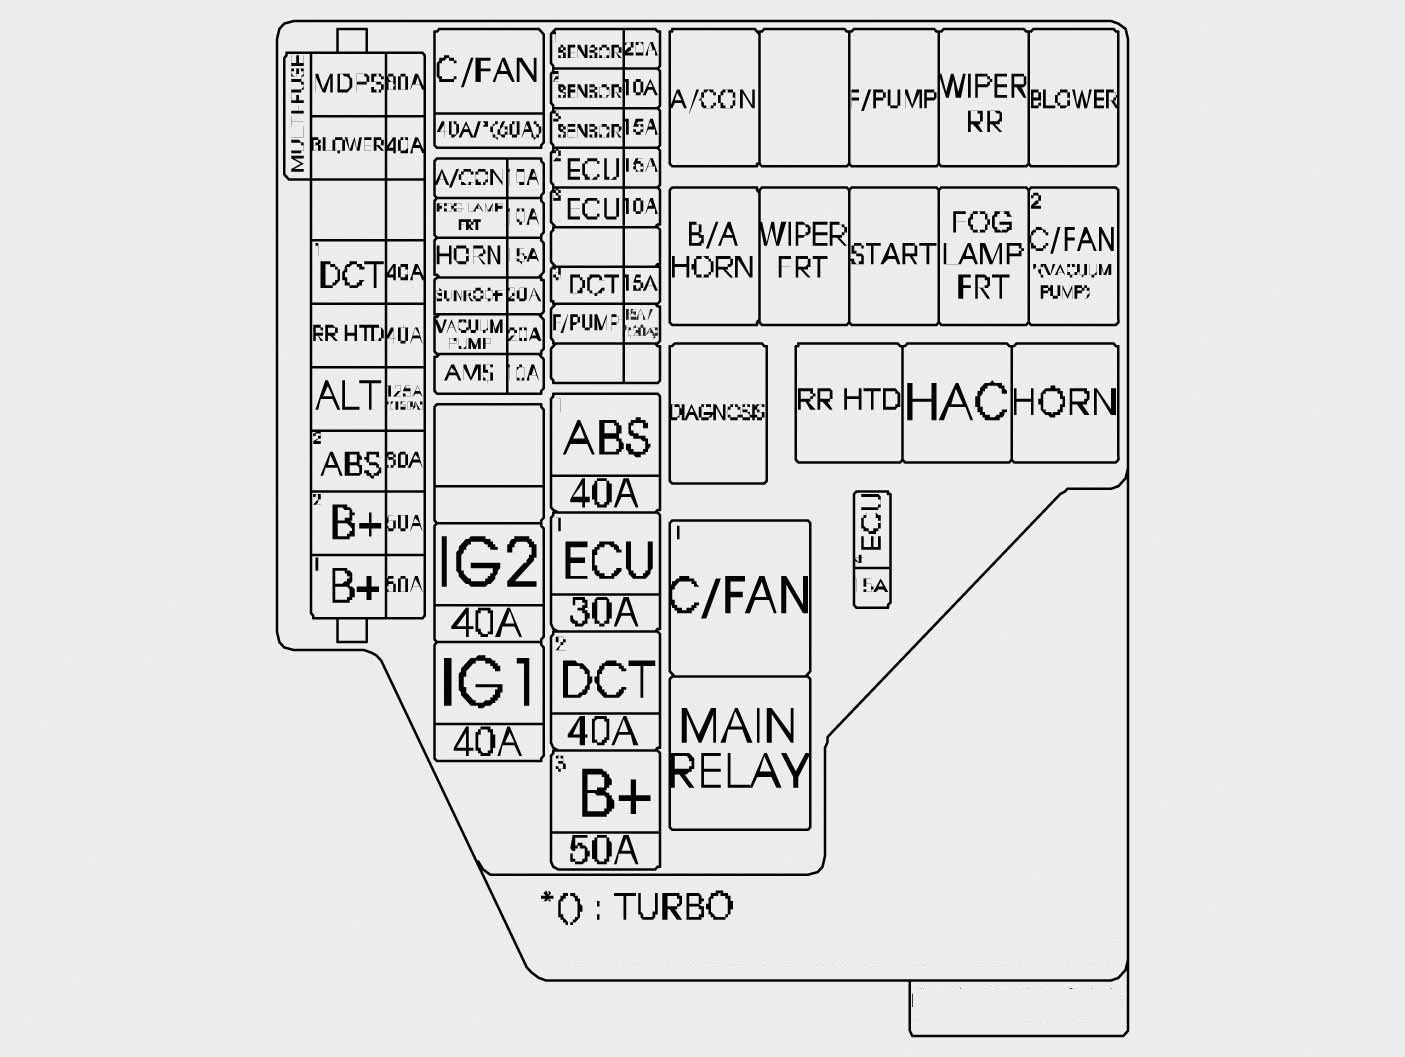 hyundai xg300 fuse box diagram hyundai atos fuse box